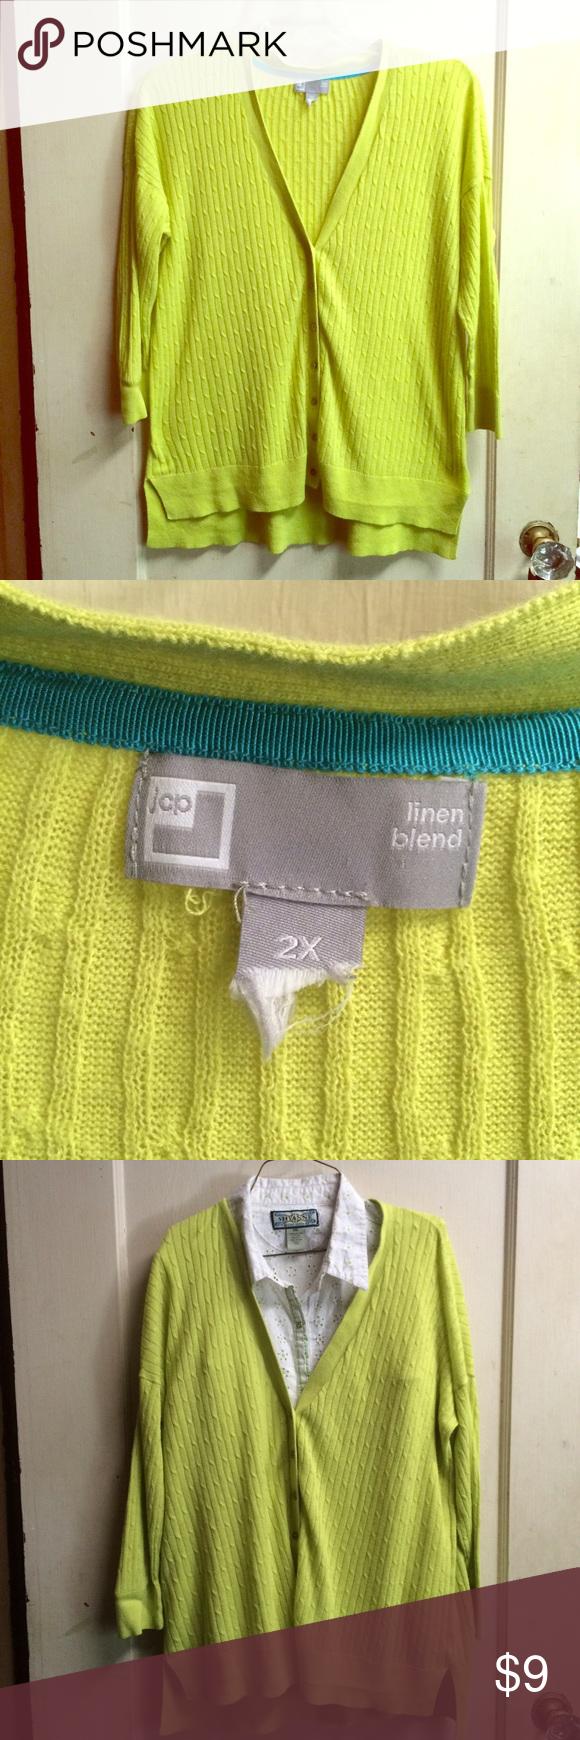 lime green lightweight cardigan half sleeve 2x Plus size 2x ...